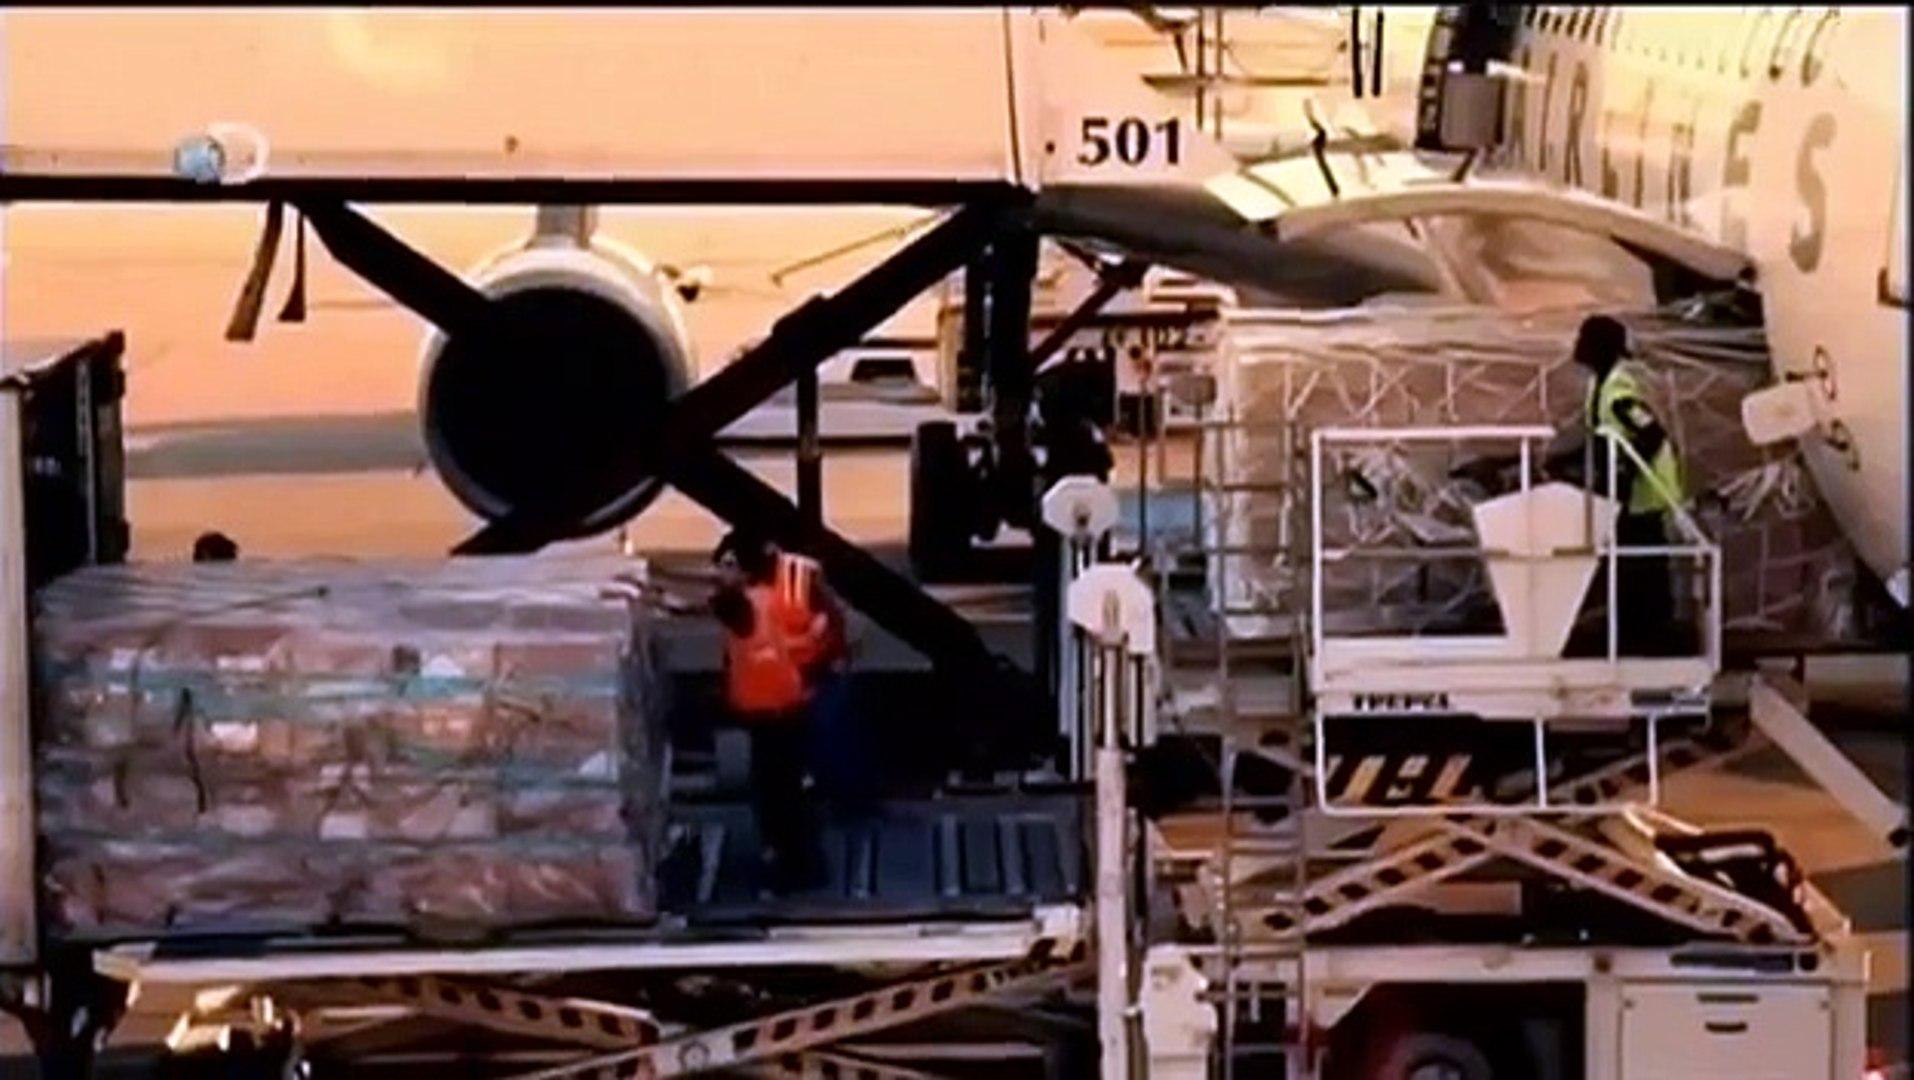 Discovery - Aircrash Confidential Season 2 - EP 2 - 737 Tail Fin Mystery